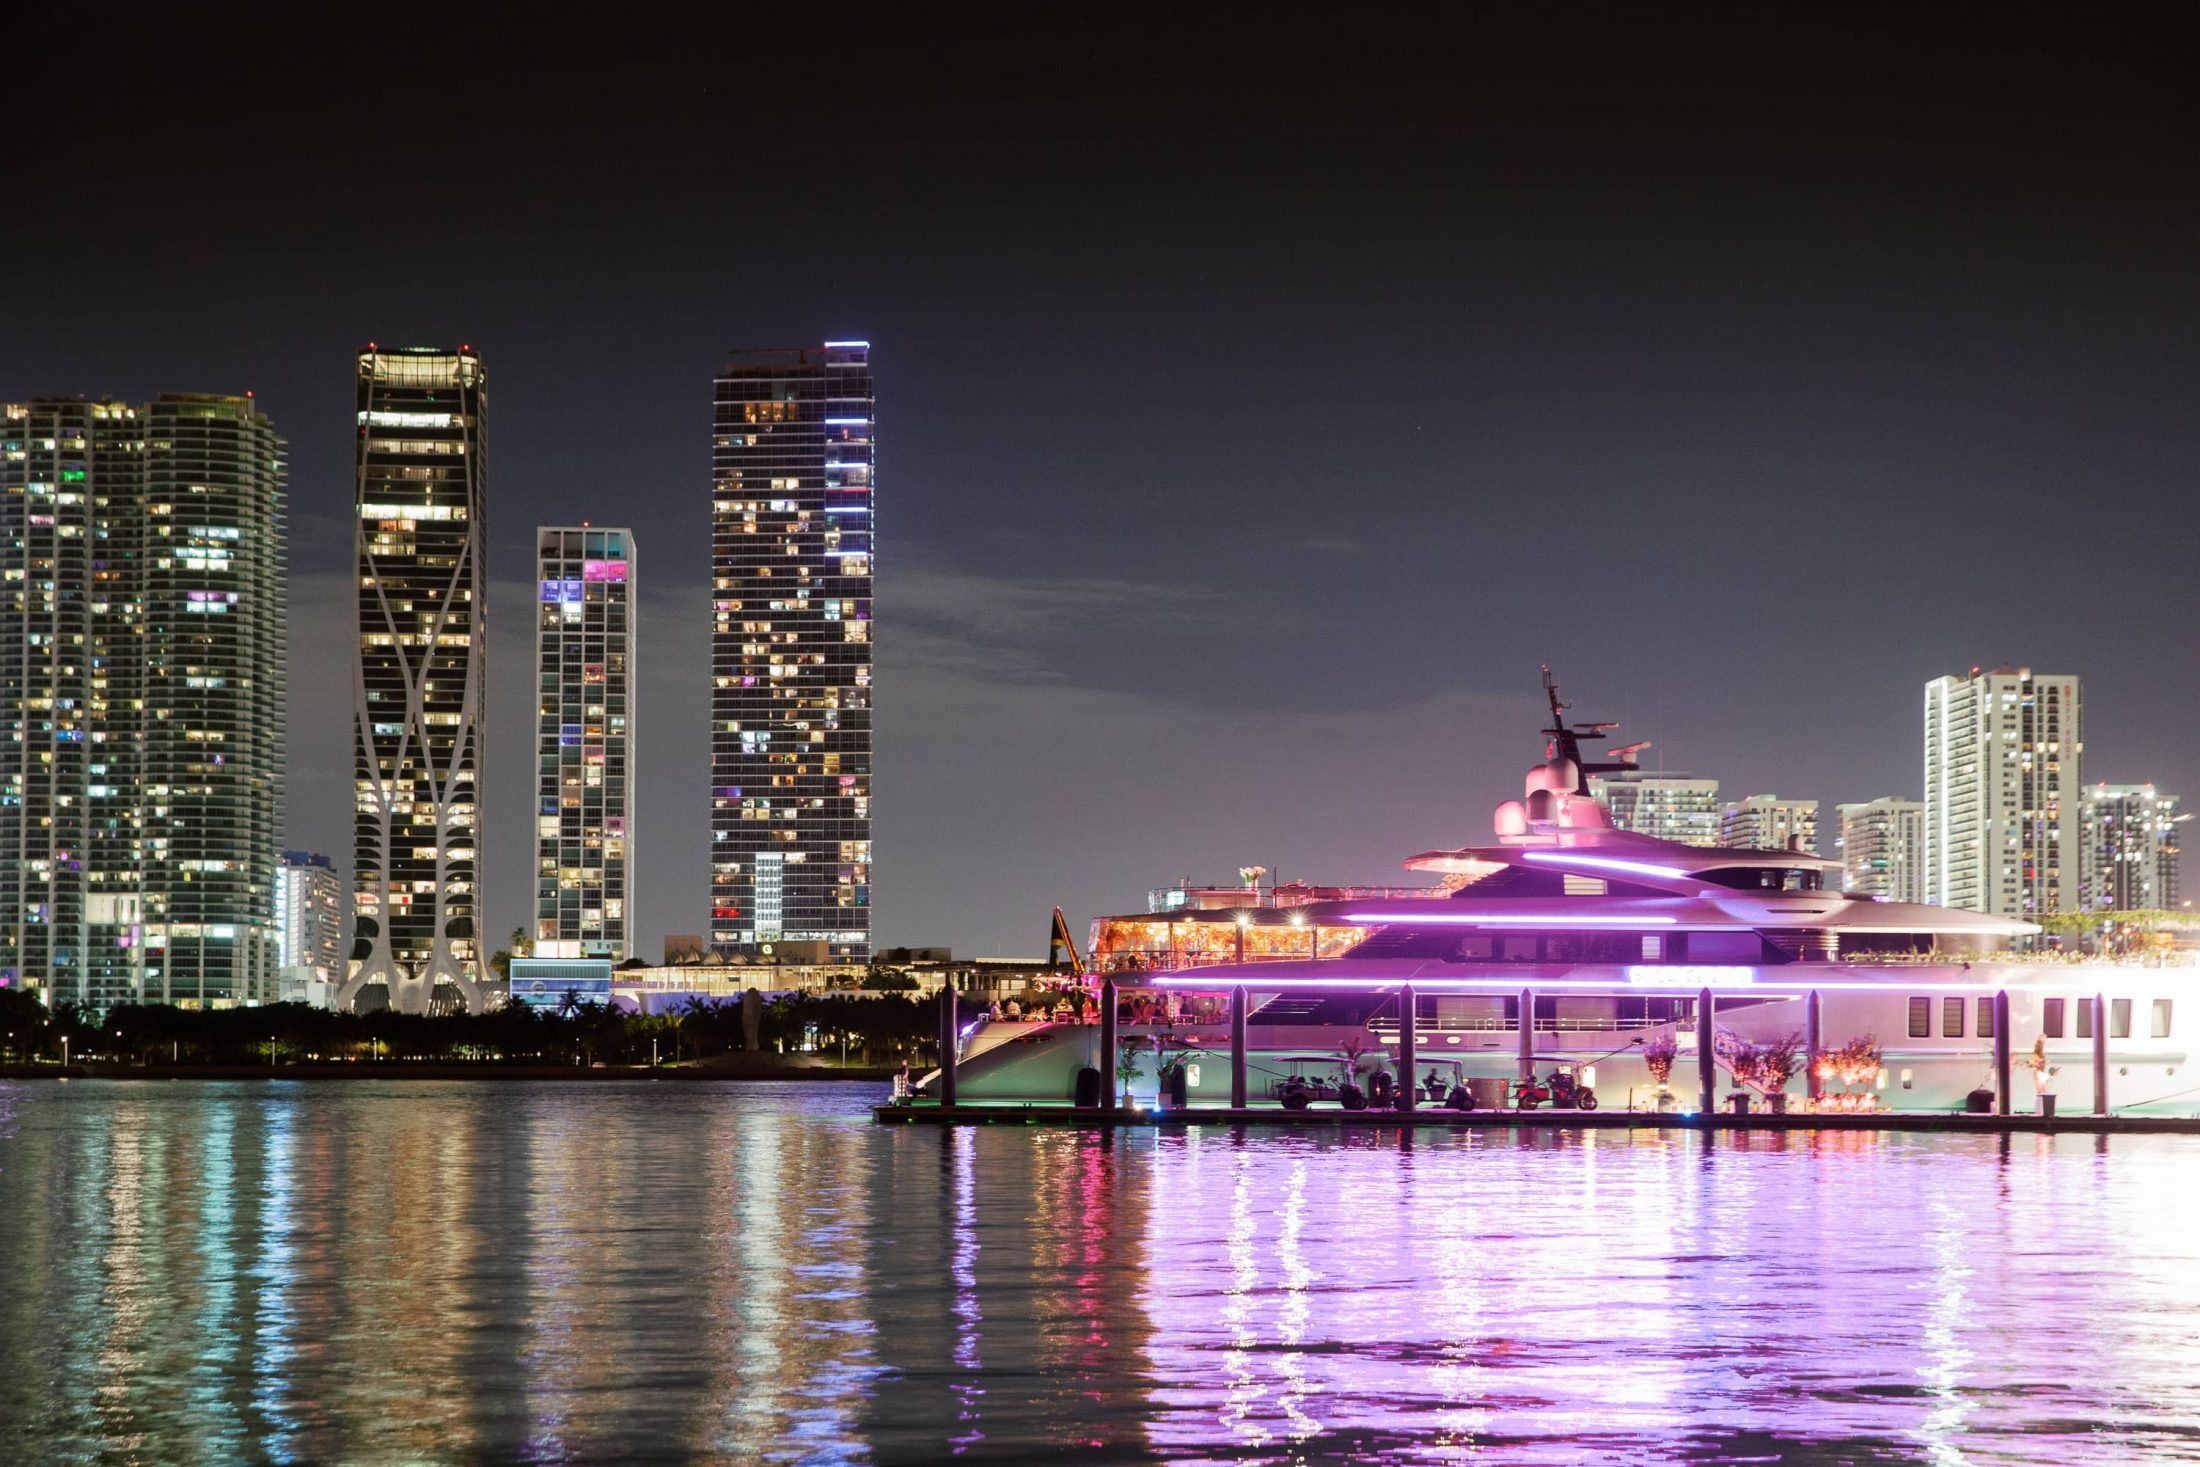 Night views at this Miami yacht wedding | Photo by Corbin Gurkin